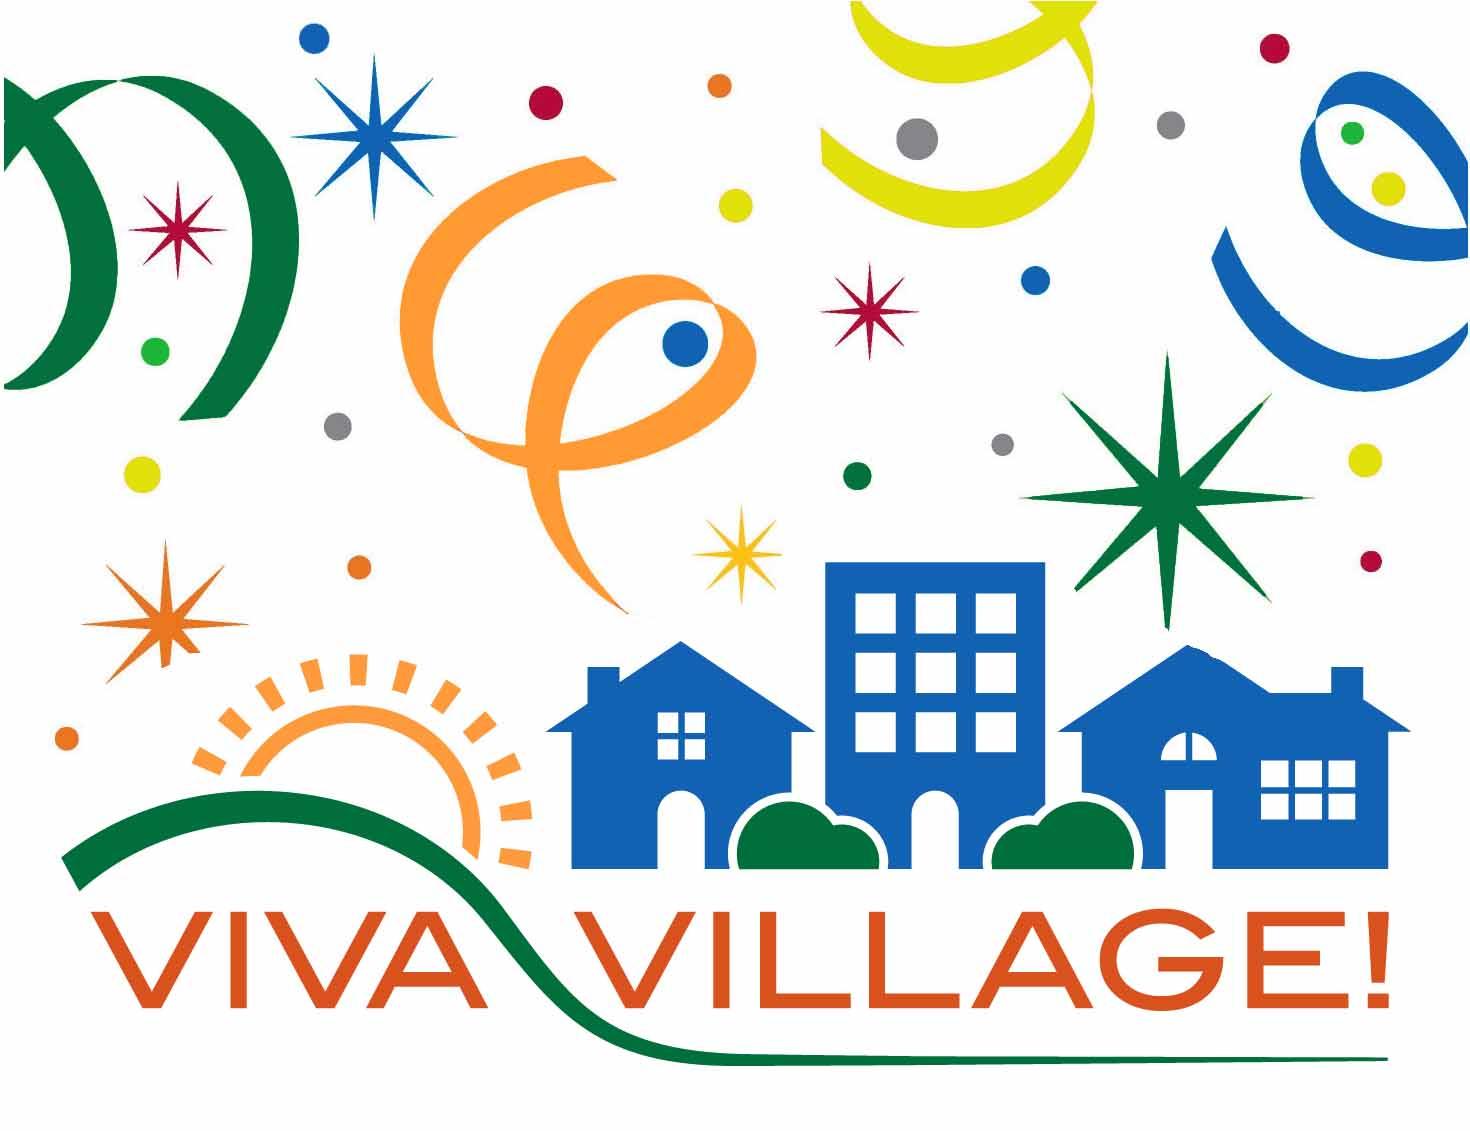 VV celebration graphic